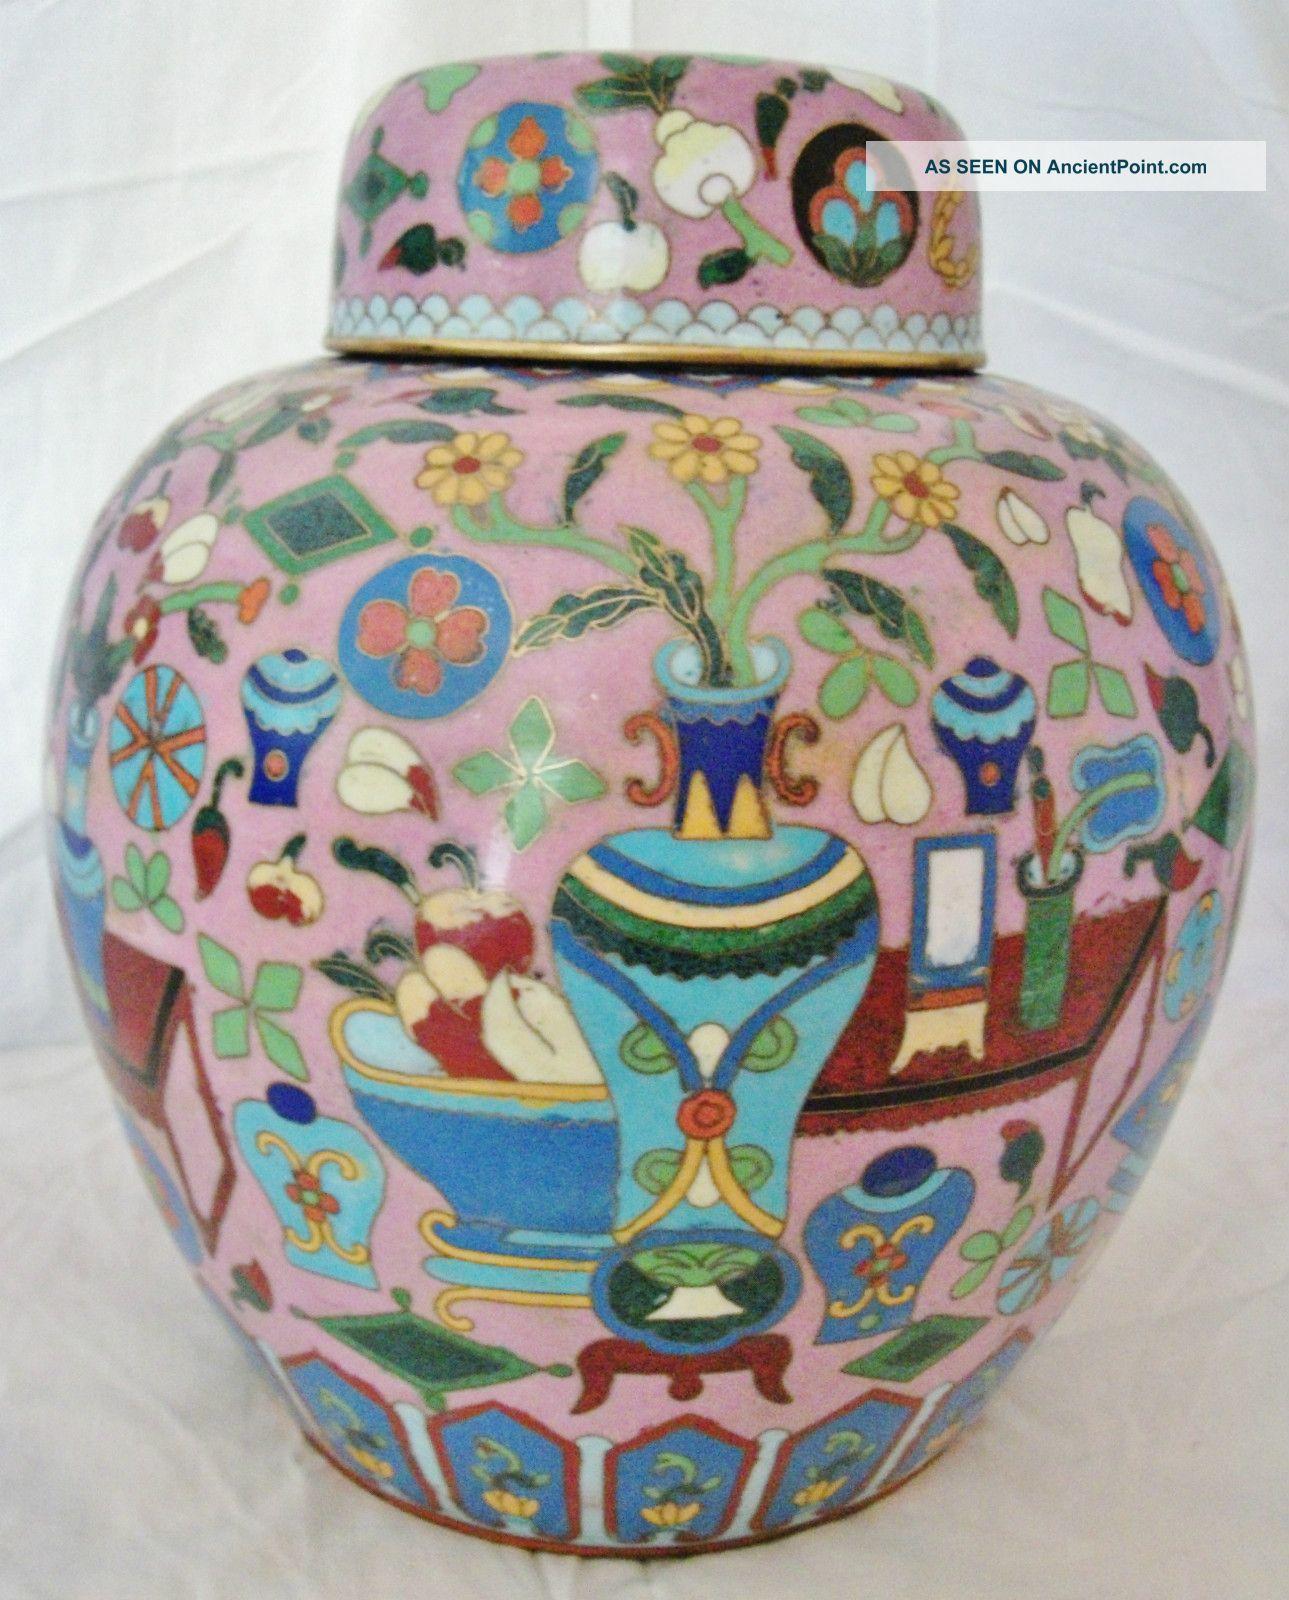 Big Pink & - Cloisonne Scholar Design Rare Antique Very High Quality Jar Vases photo